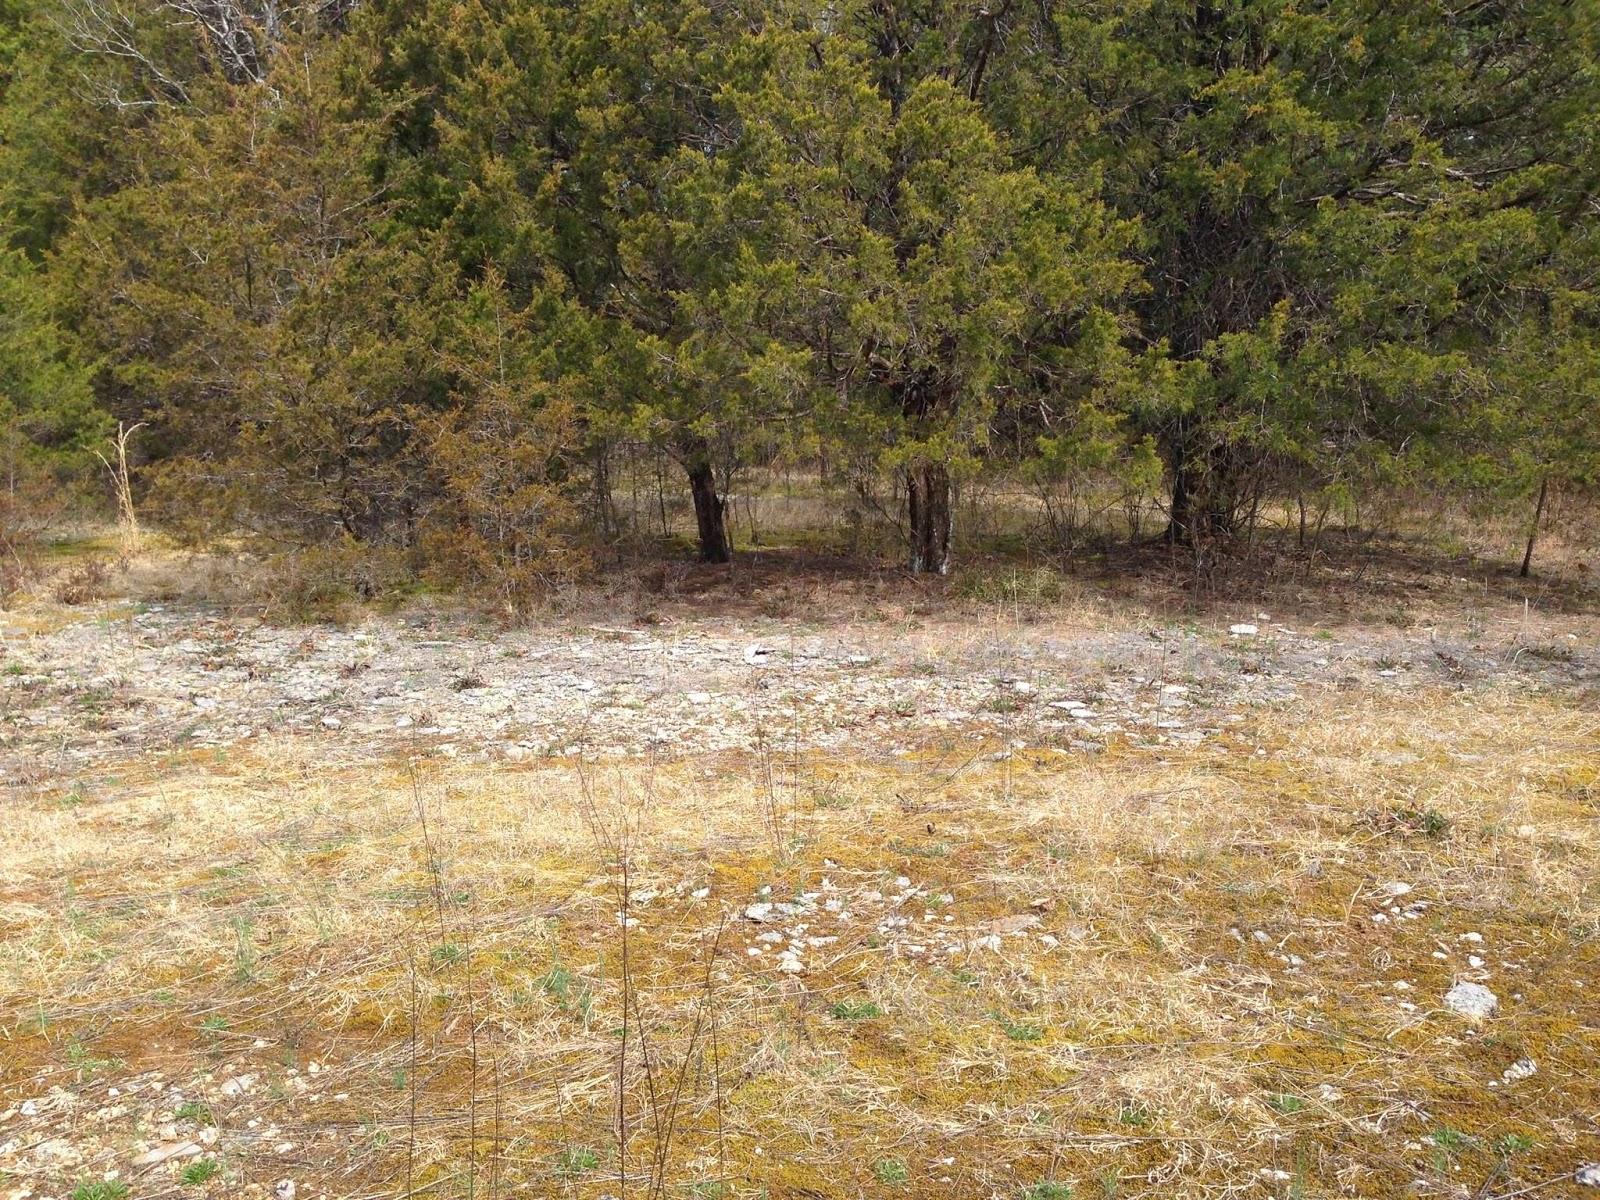 Smallworld cedars of lebanon state park for Cedars of lebanon cabins